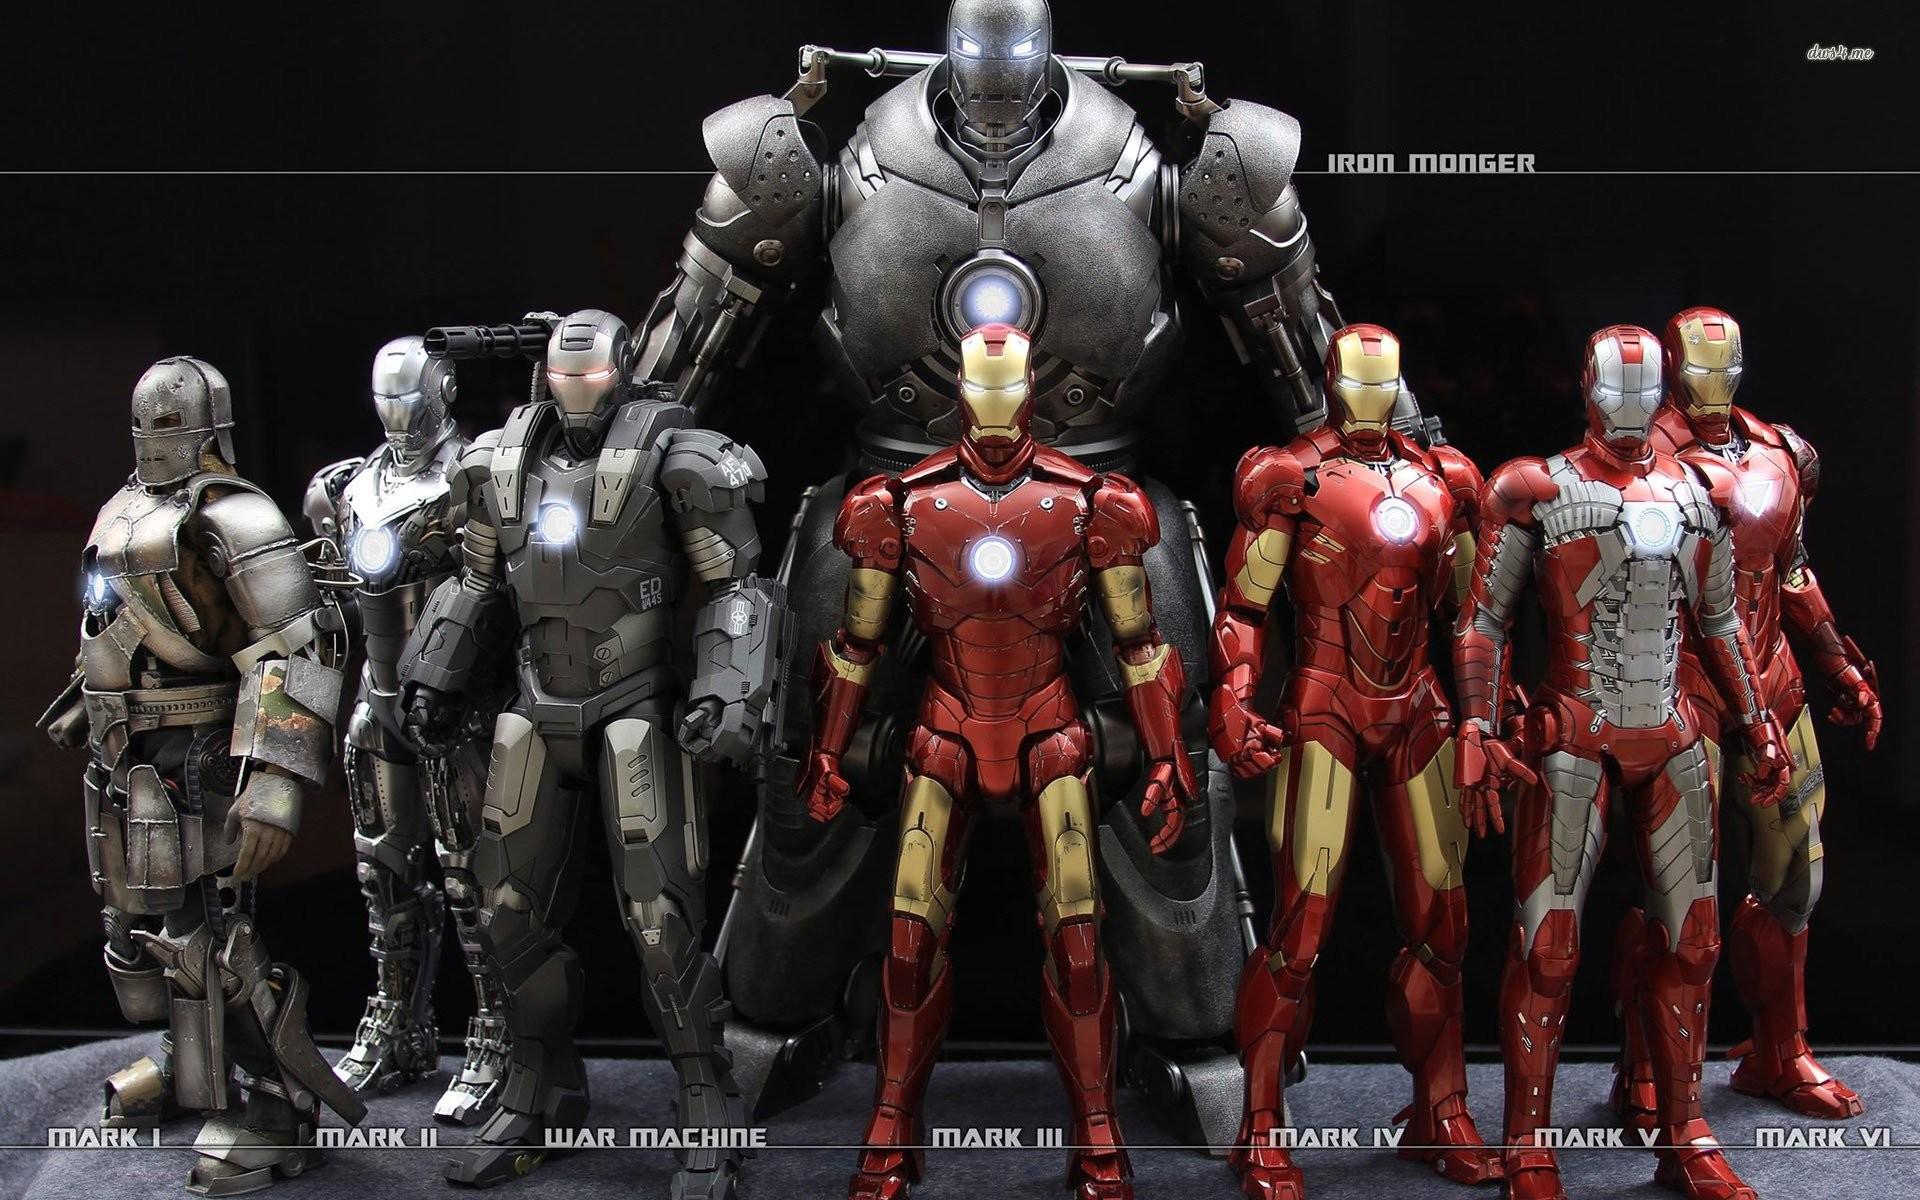 Papel de Parede HD   Plano de Fundo ID:507807. Filme Iron Man